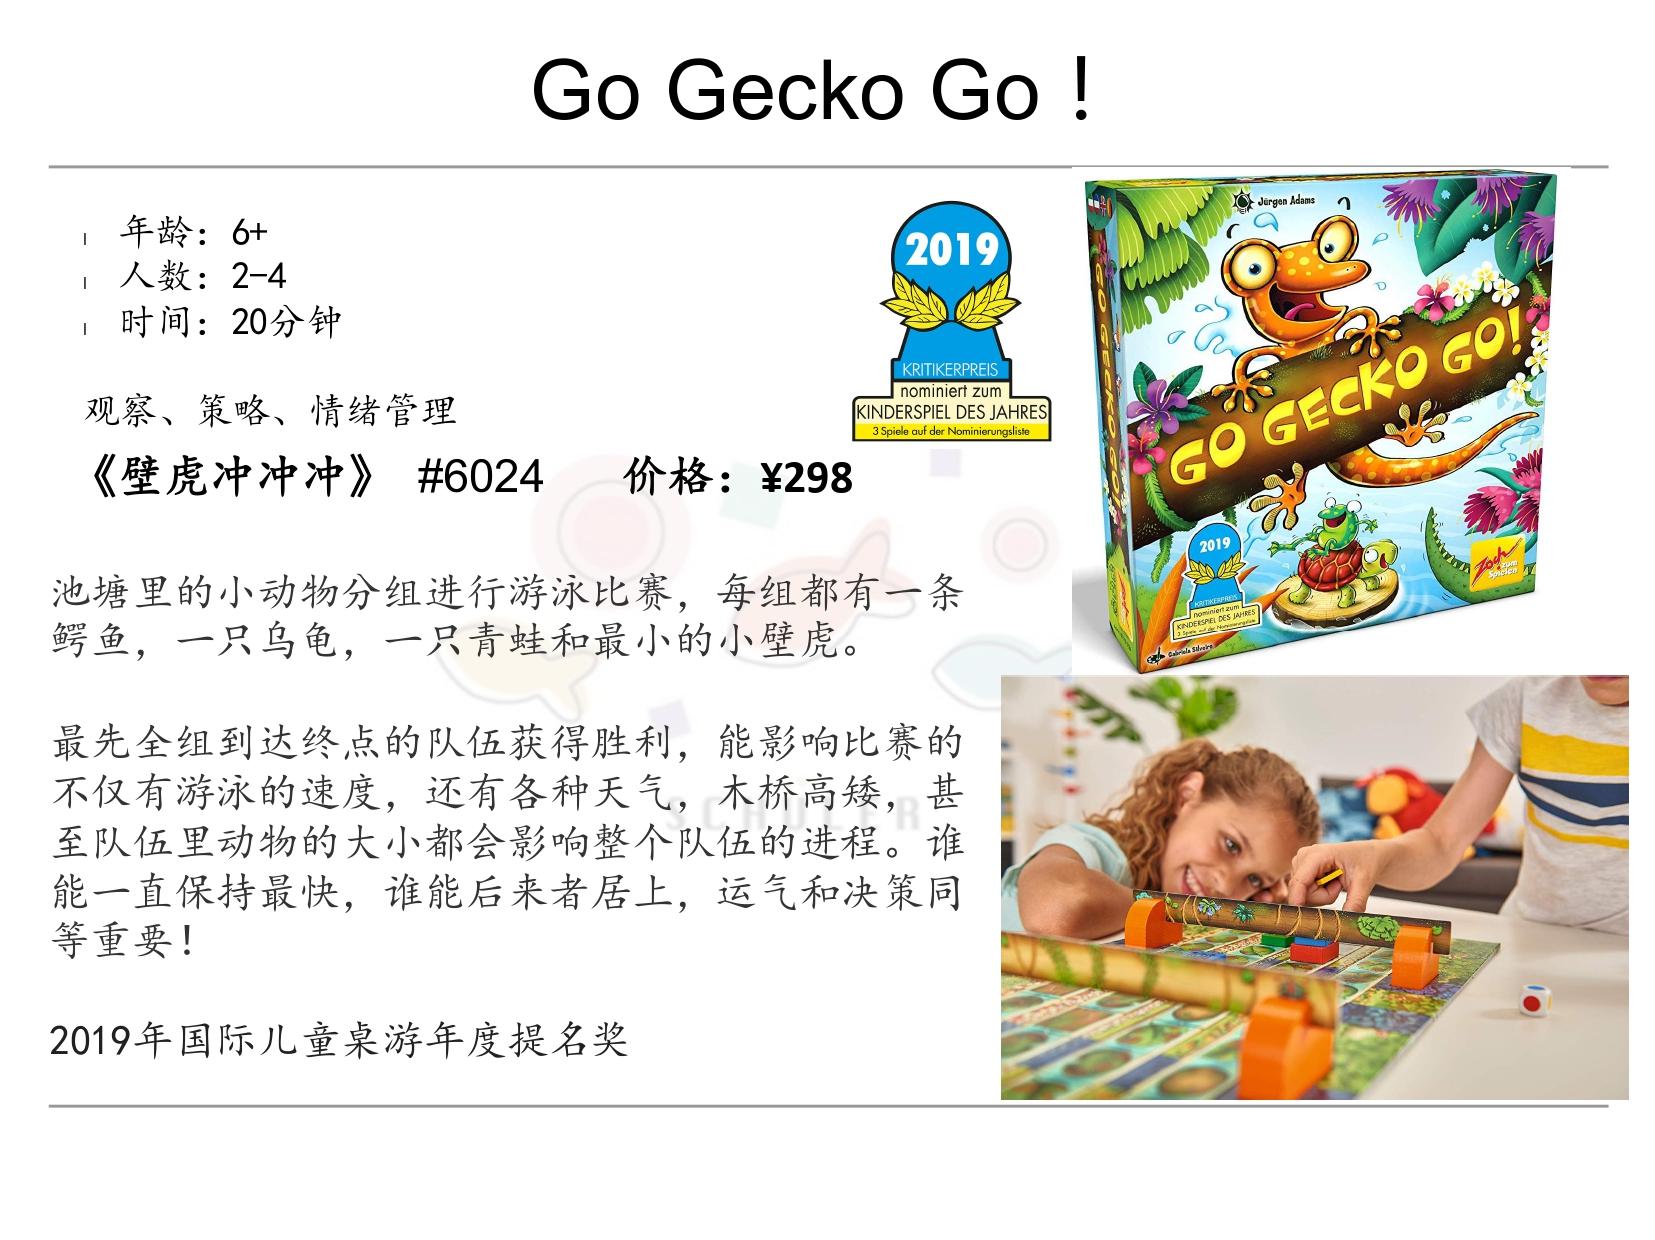 Go Gecko Go! 壁虎冲冲冲